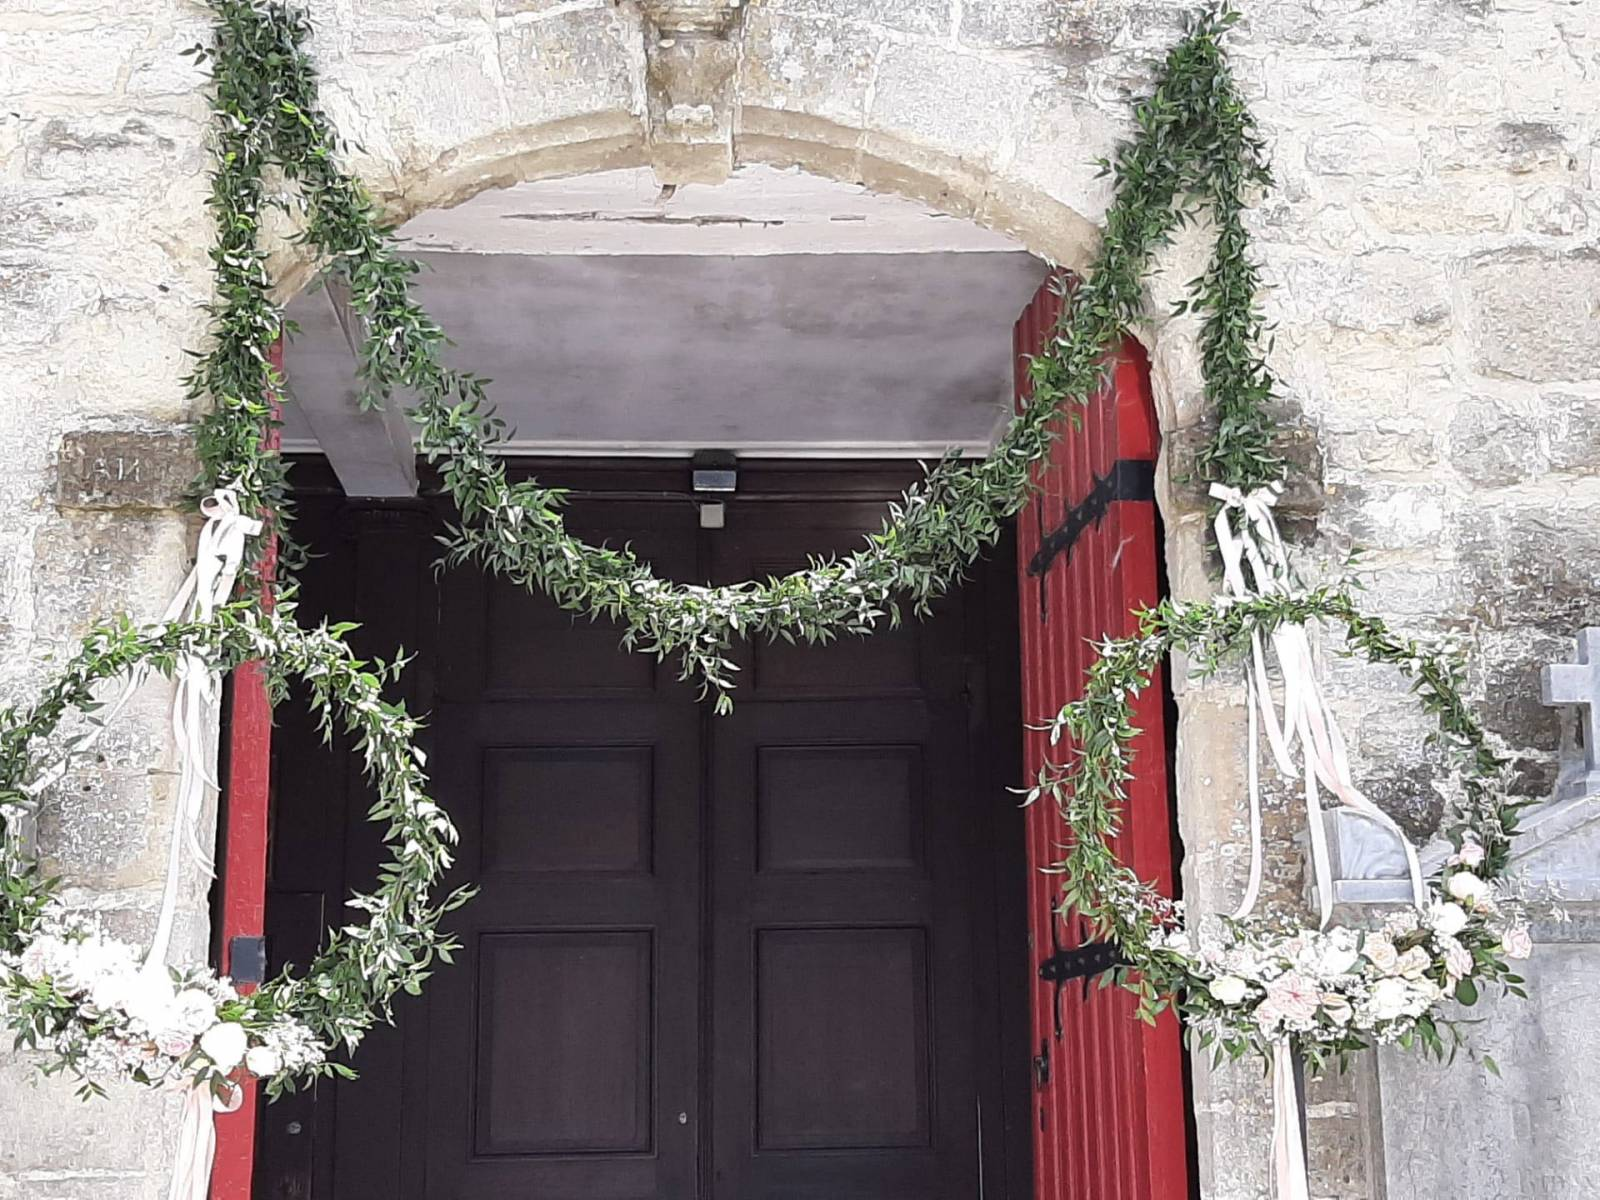 Annick Van Wesemael - Bruidsboeket - Trouwboeket - Bloemen decoratie - House of Weddings - 5